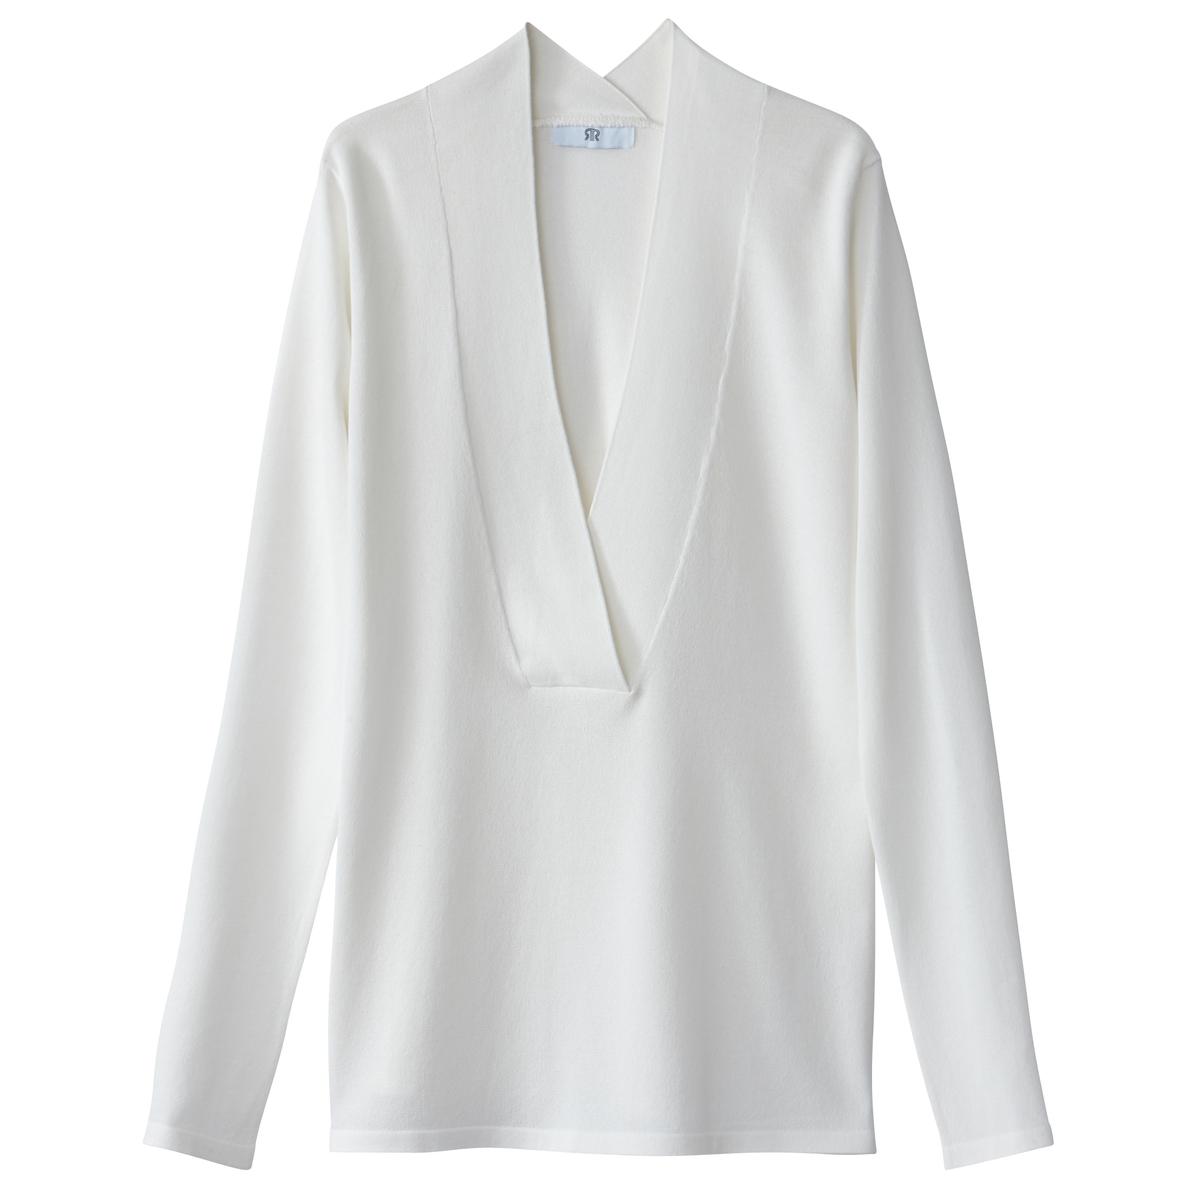 Jersey con cuello de pico, de punto fino